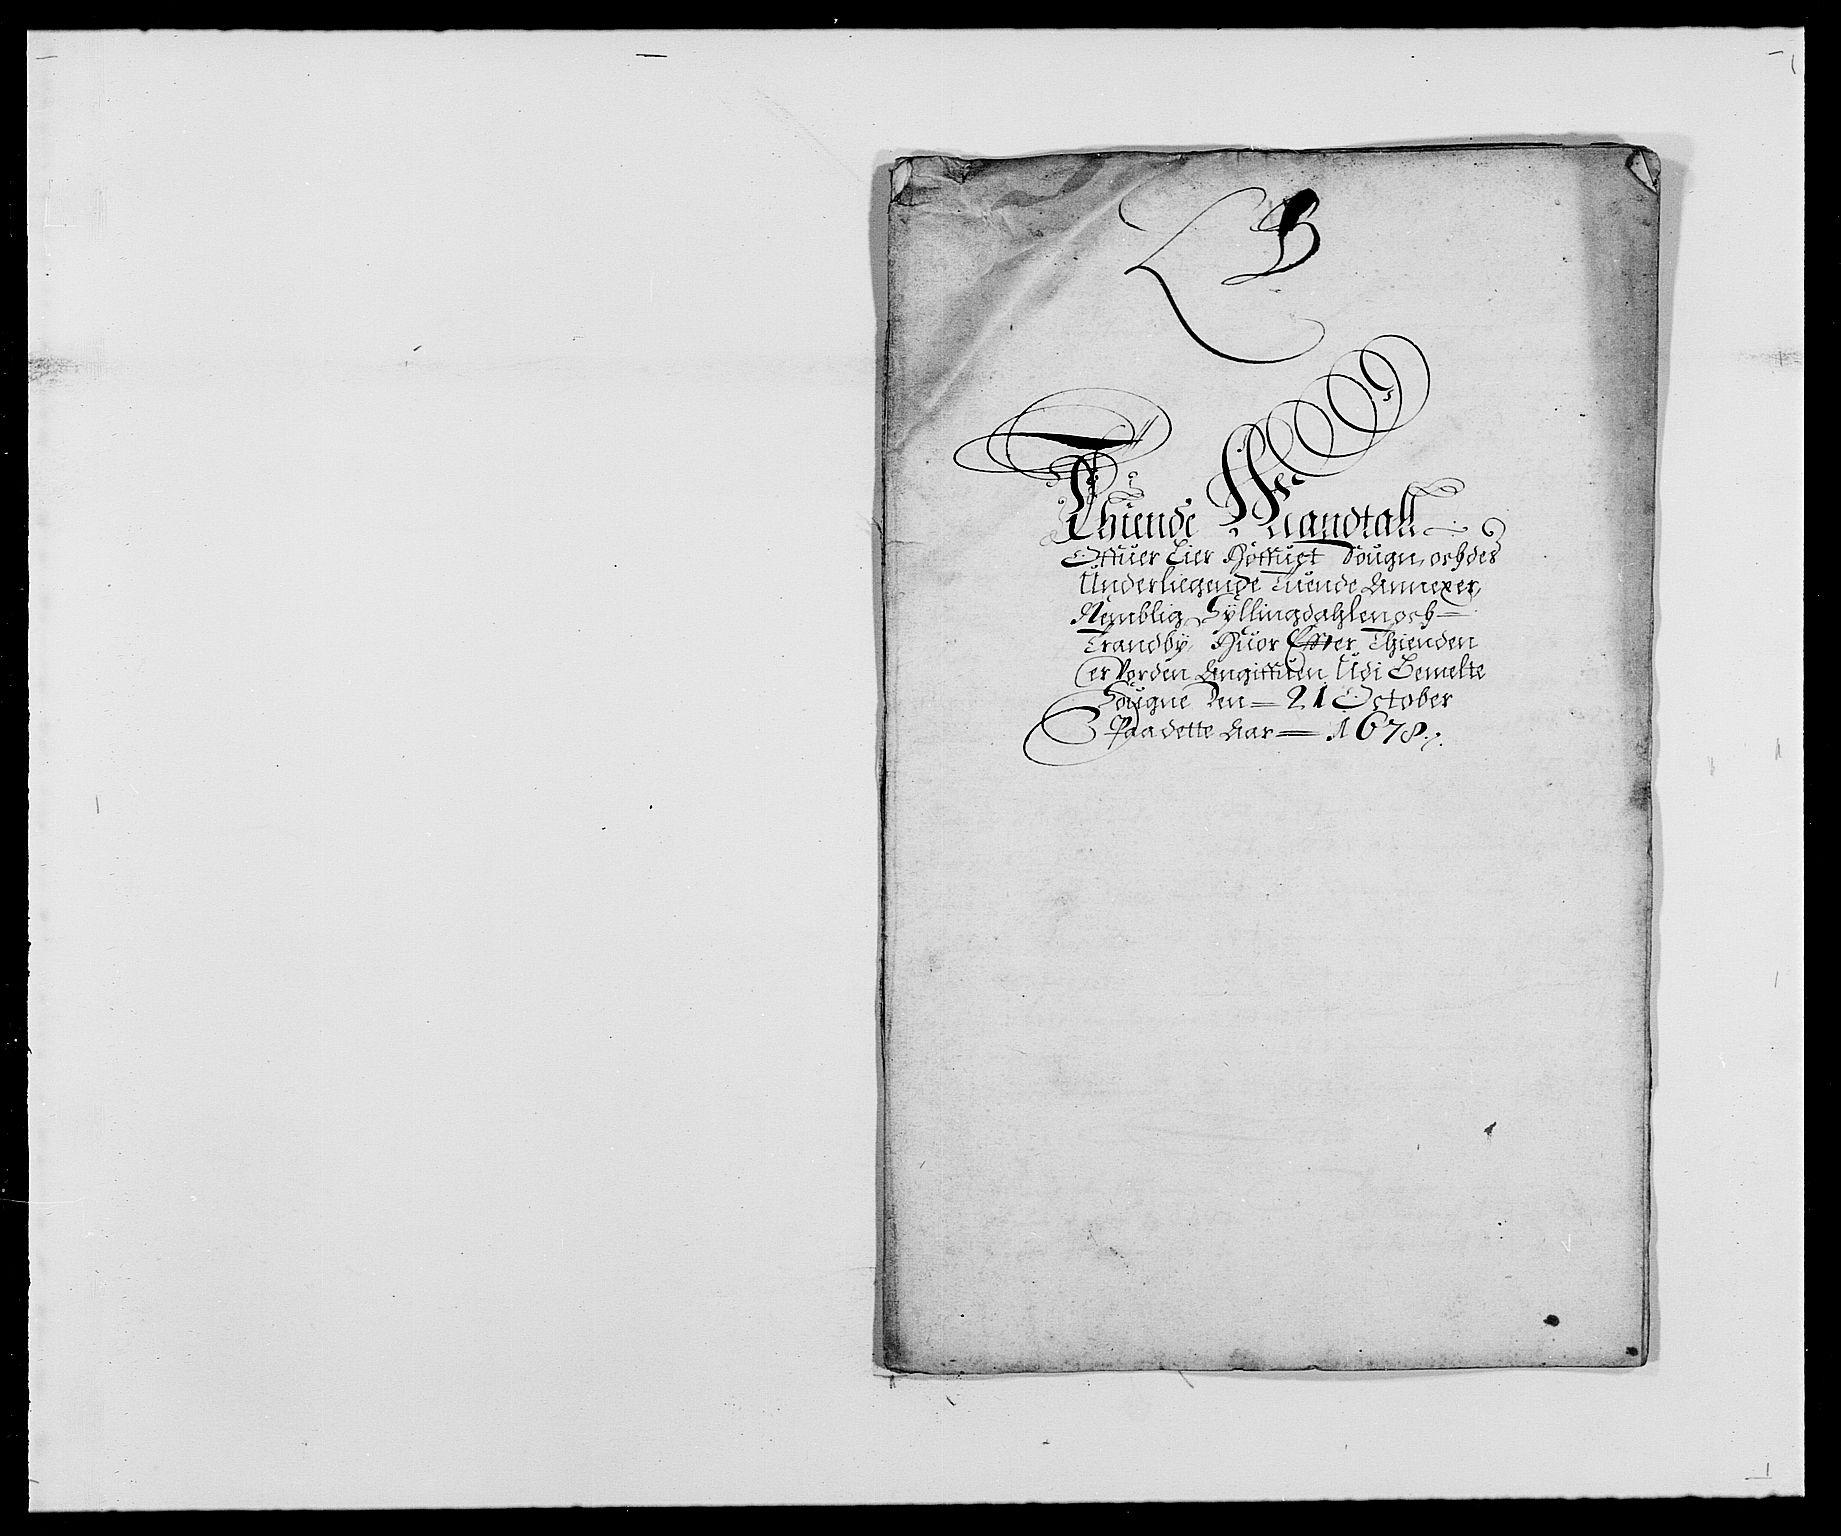 RA, Rentekammeret inntil 1814, Reviderte regnskaper, Fogderegnskap, R27/L1686: Fogderegnskap Lier, 1678-1686, s. 43